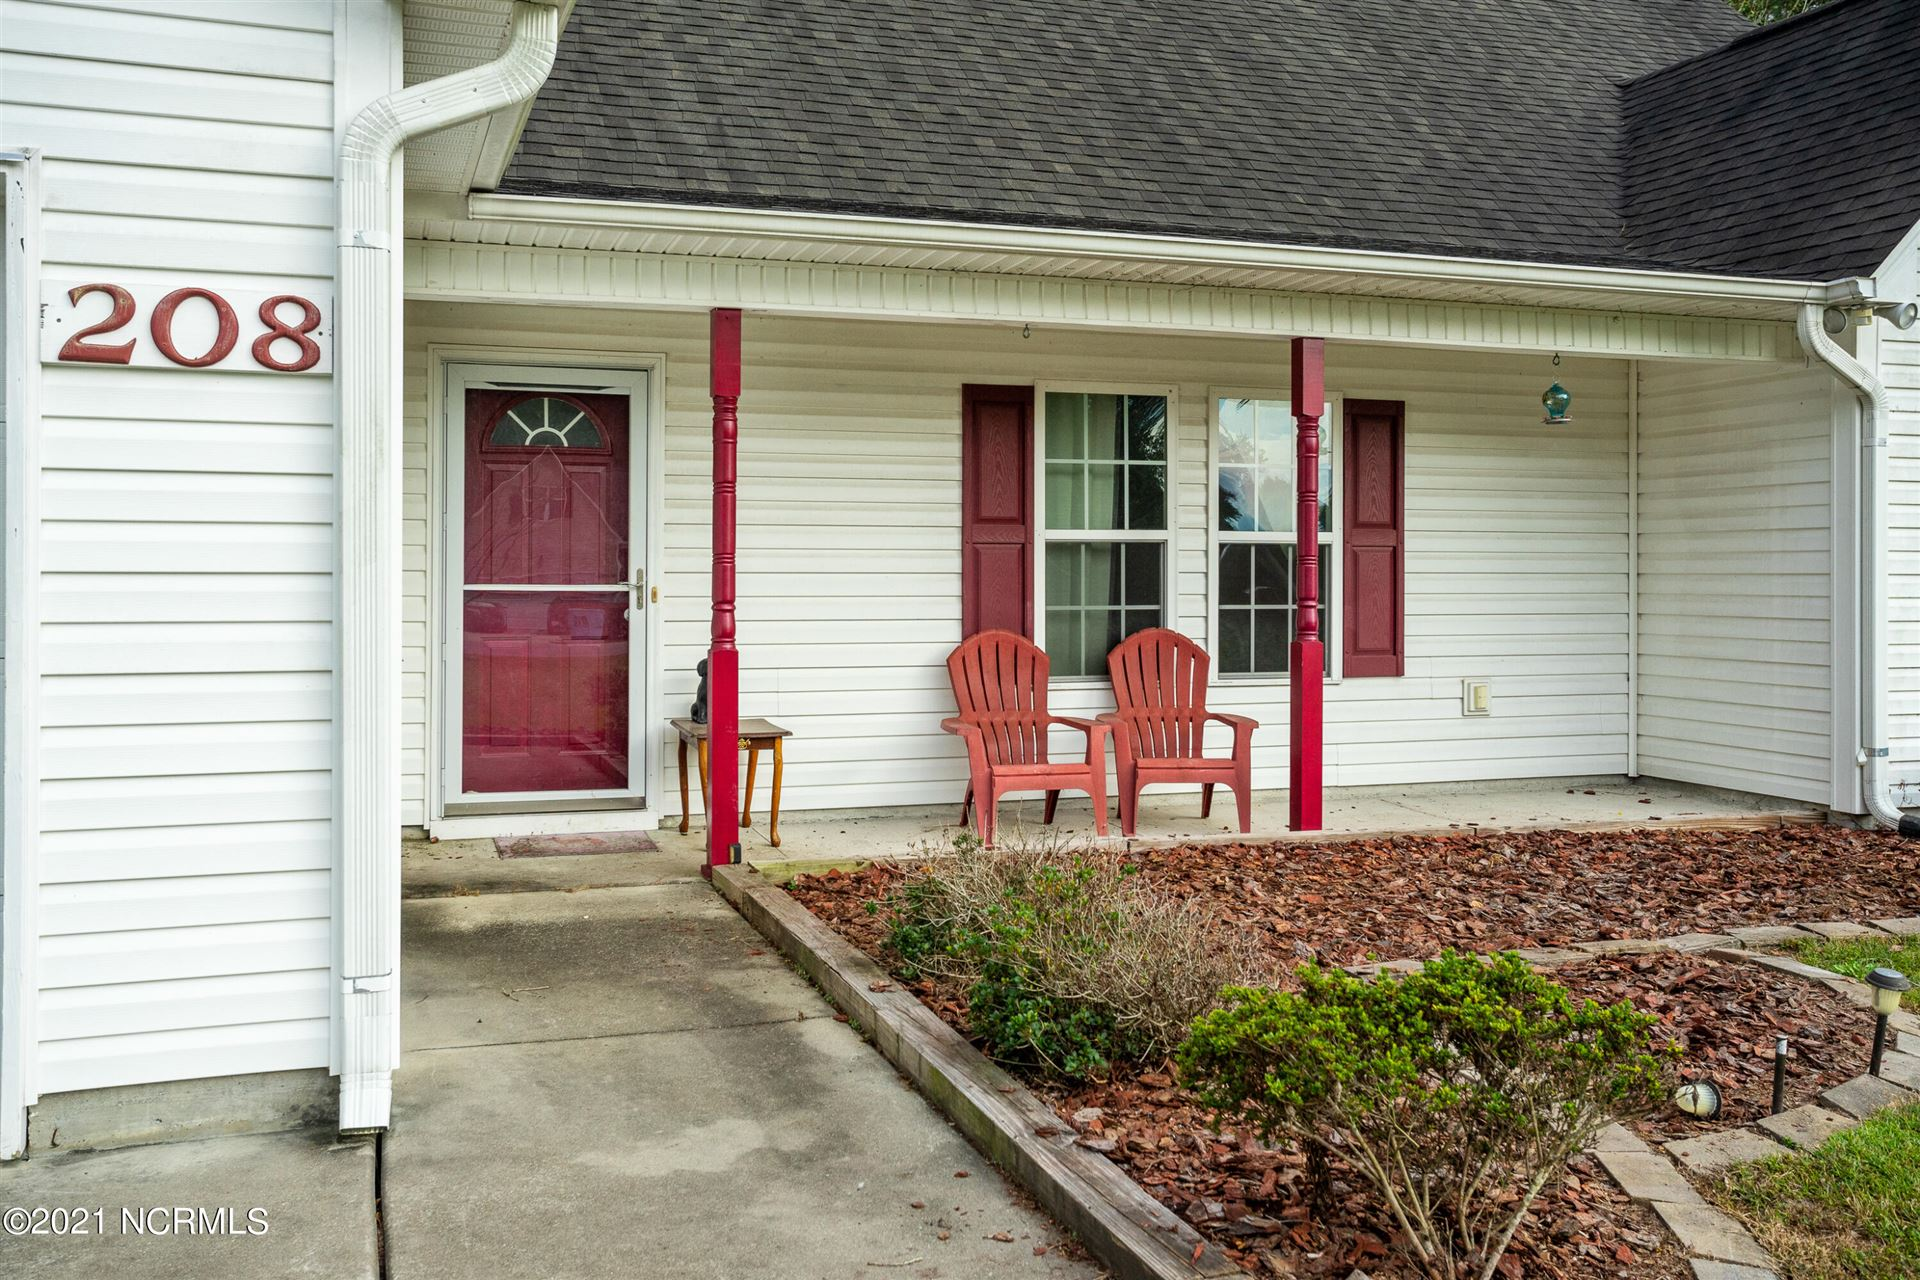 Photo of 208 Chandler Simpson Court, Beulaville, NC 28518 (MLS # 100294284)